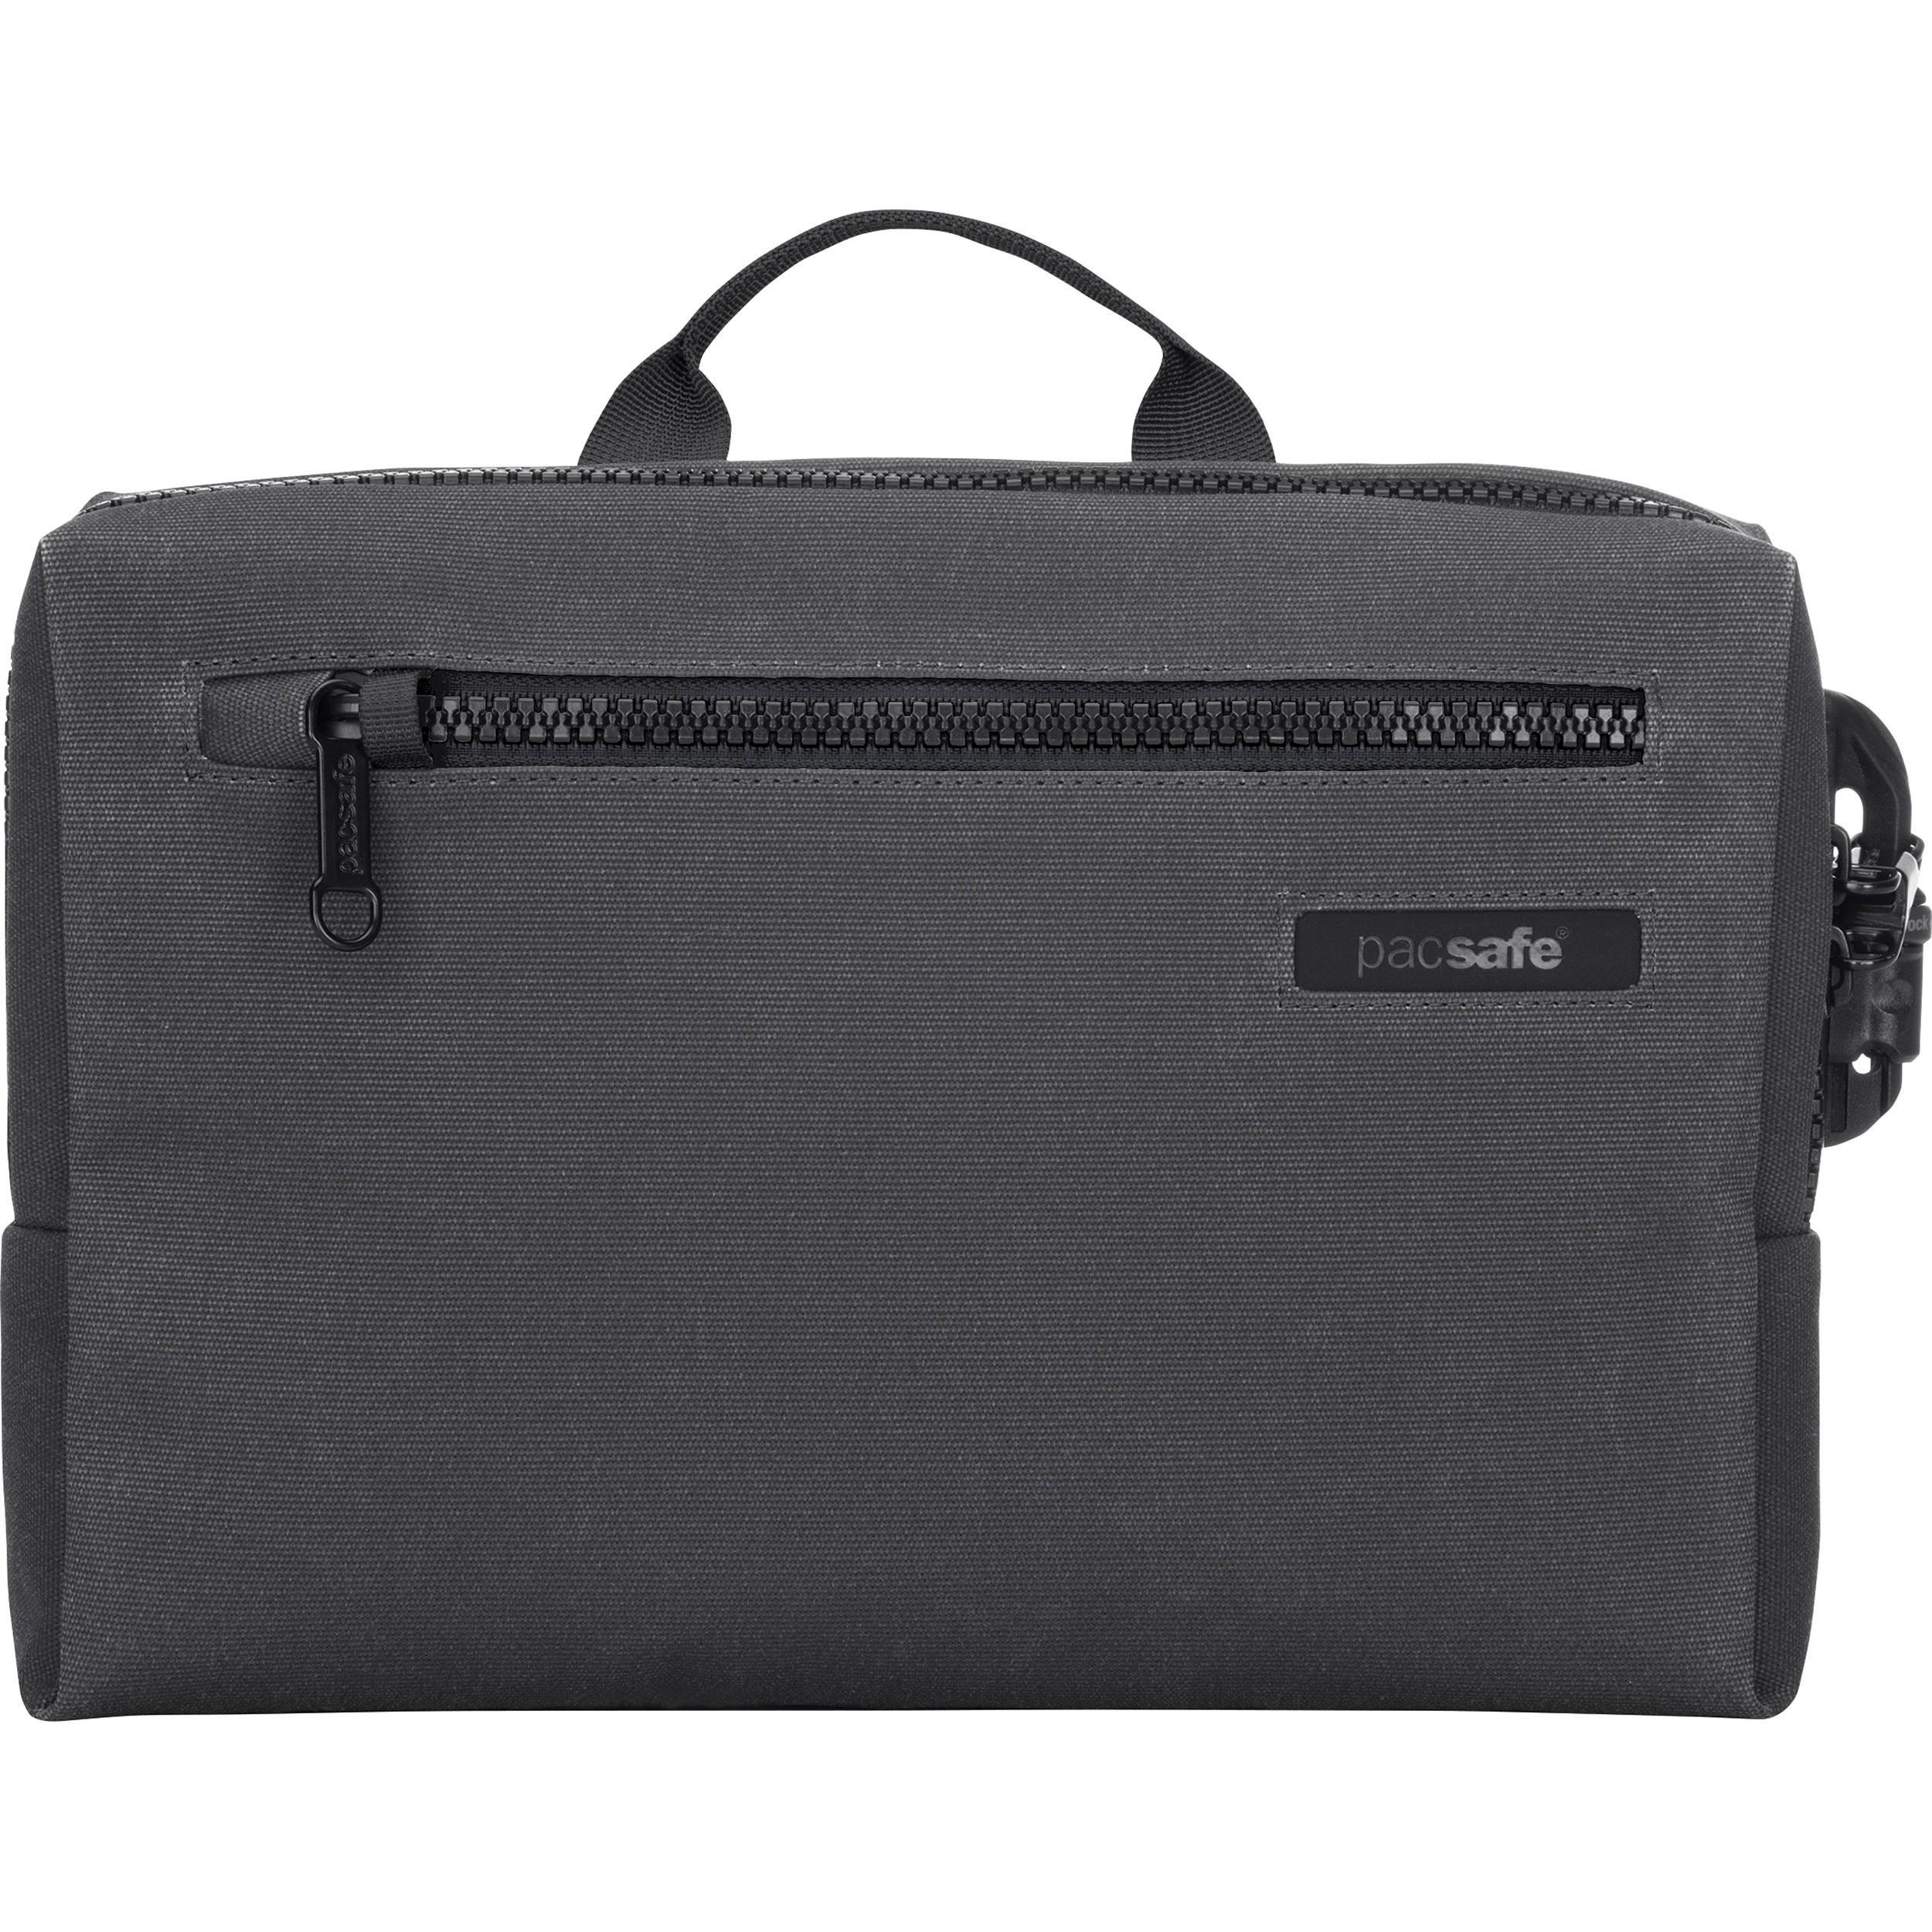 Pacsafe Intasafe Brief Anti Theft Cross Body Laptop Bag 25101104 Notebook Protector Charcoal